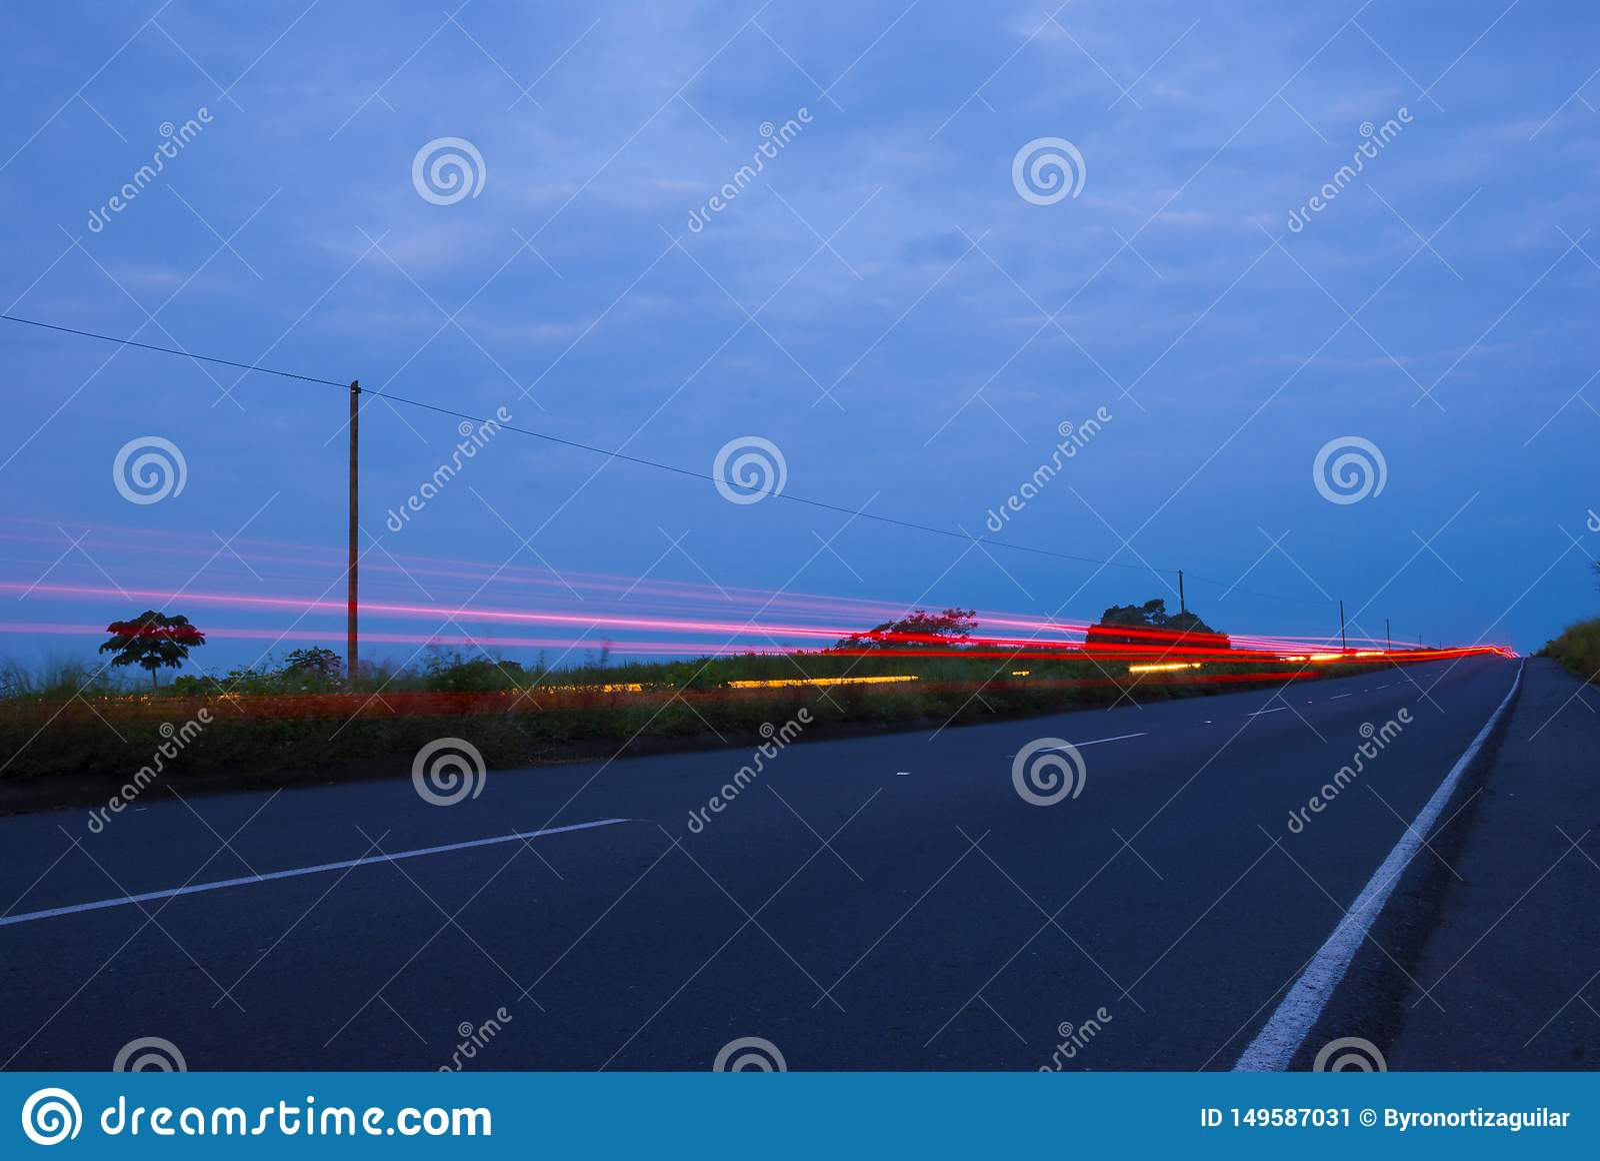 Speedingon de los coches una carretera, Guatemala, America Central, coche de la velocidad